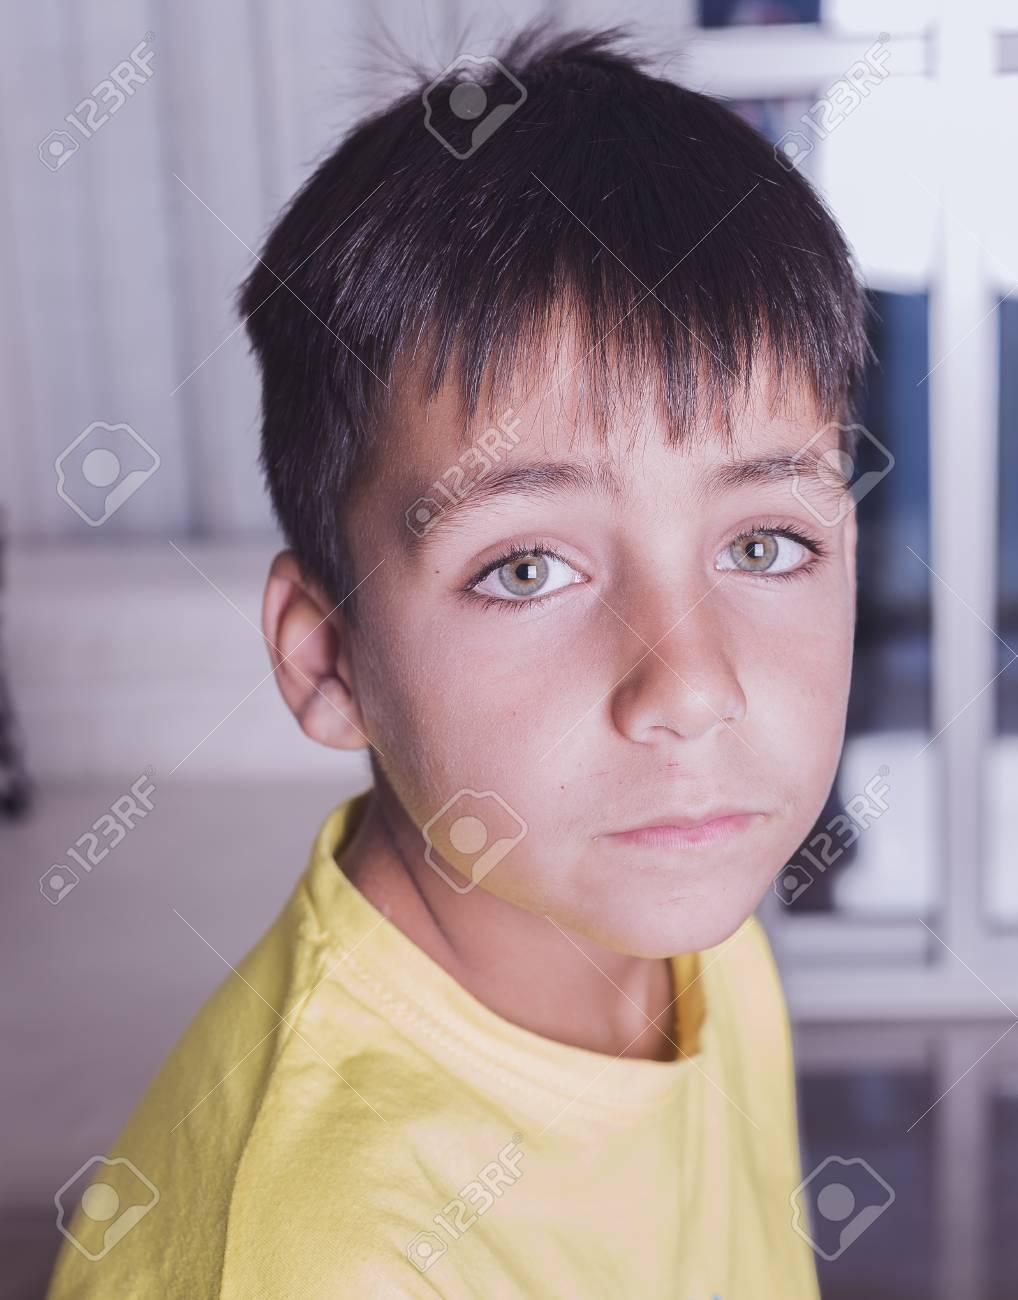 chico ojos verdes